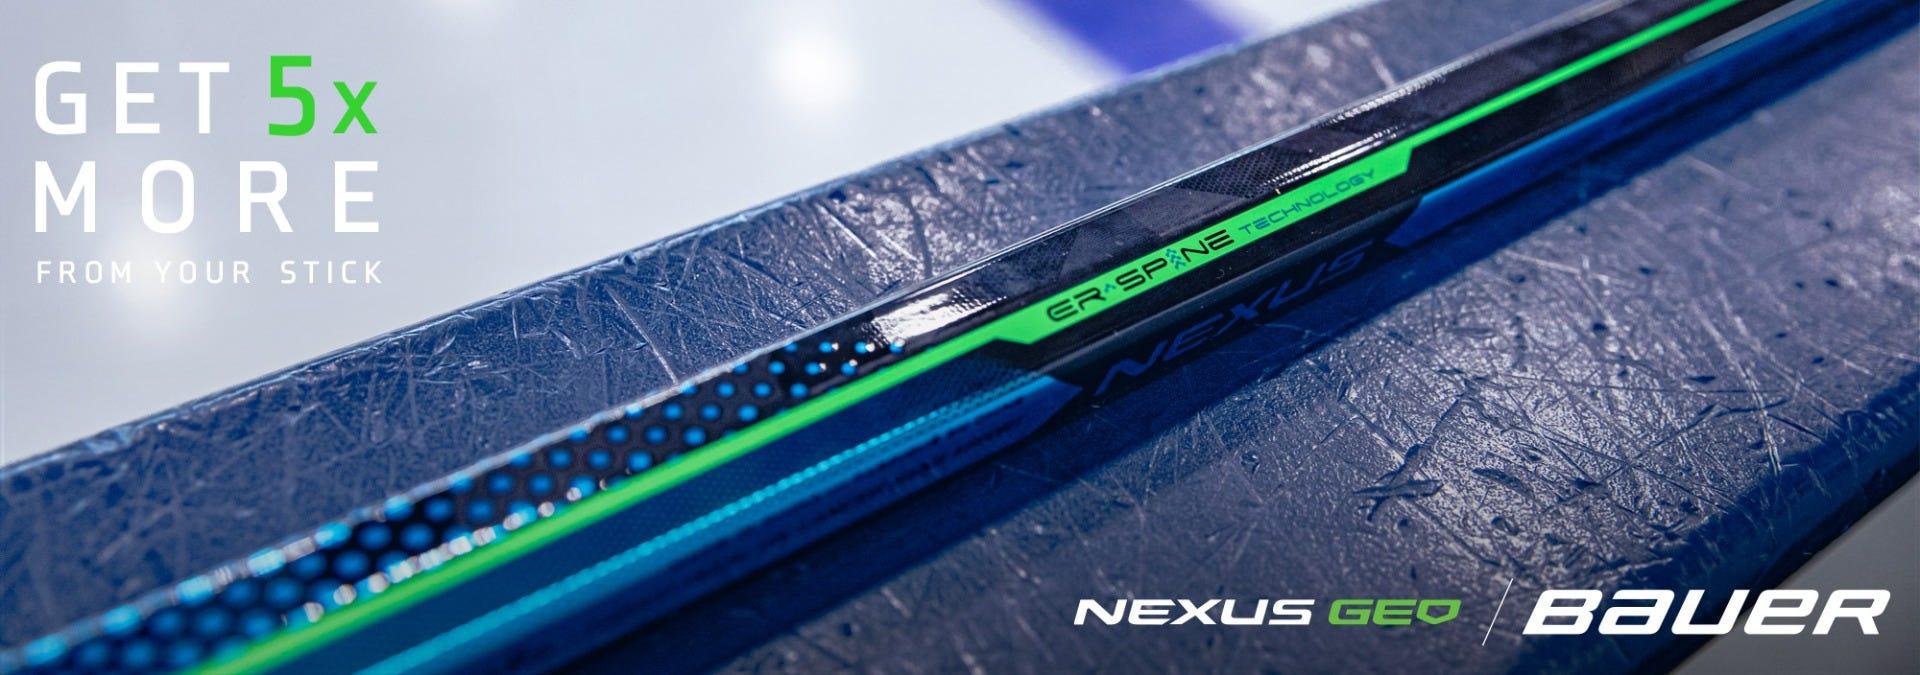 Bauer Nexus Geo: Get 5x more from your stick